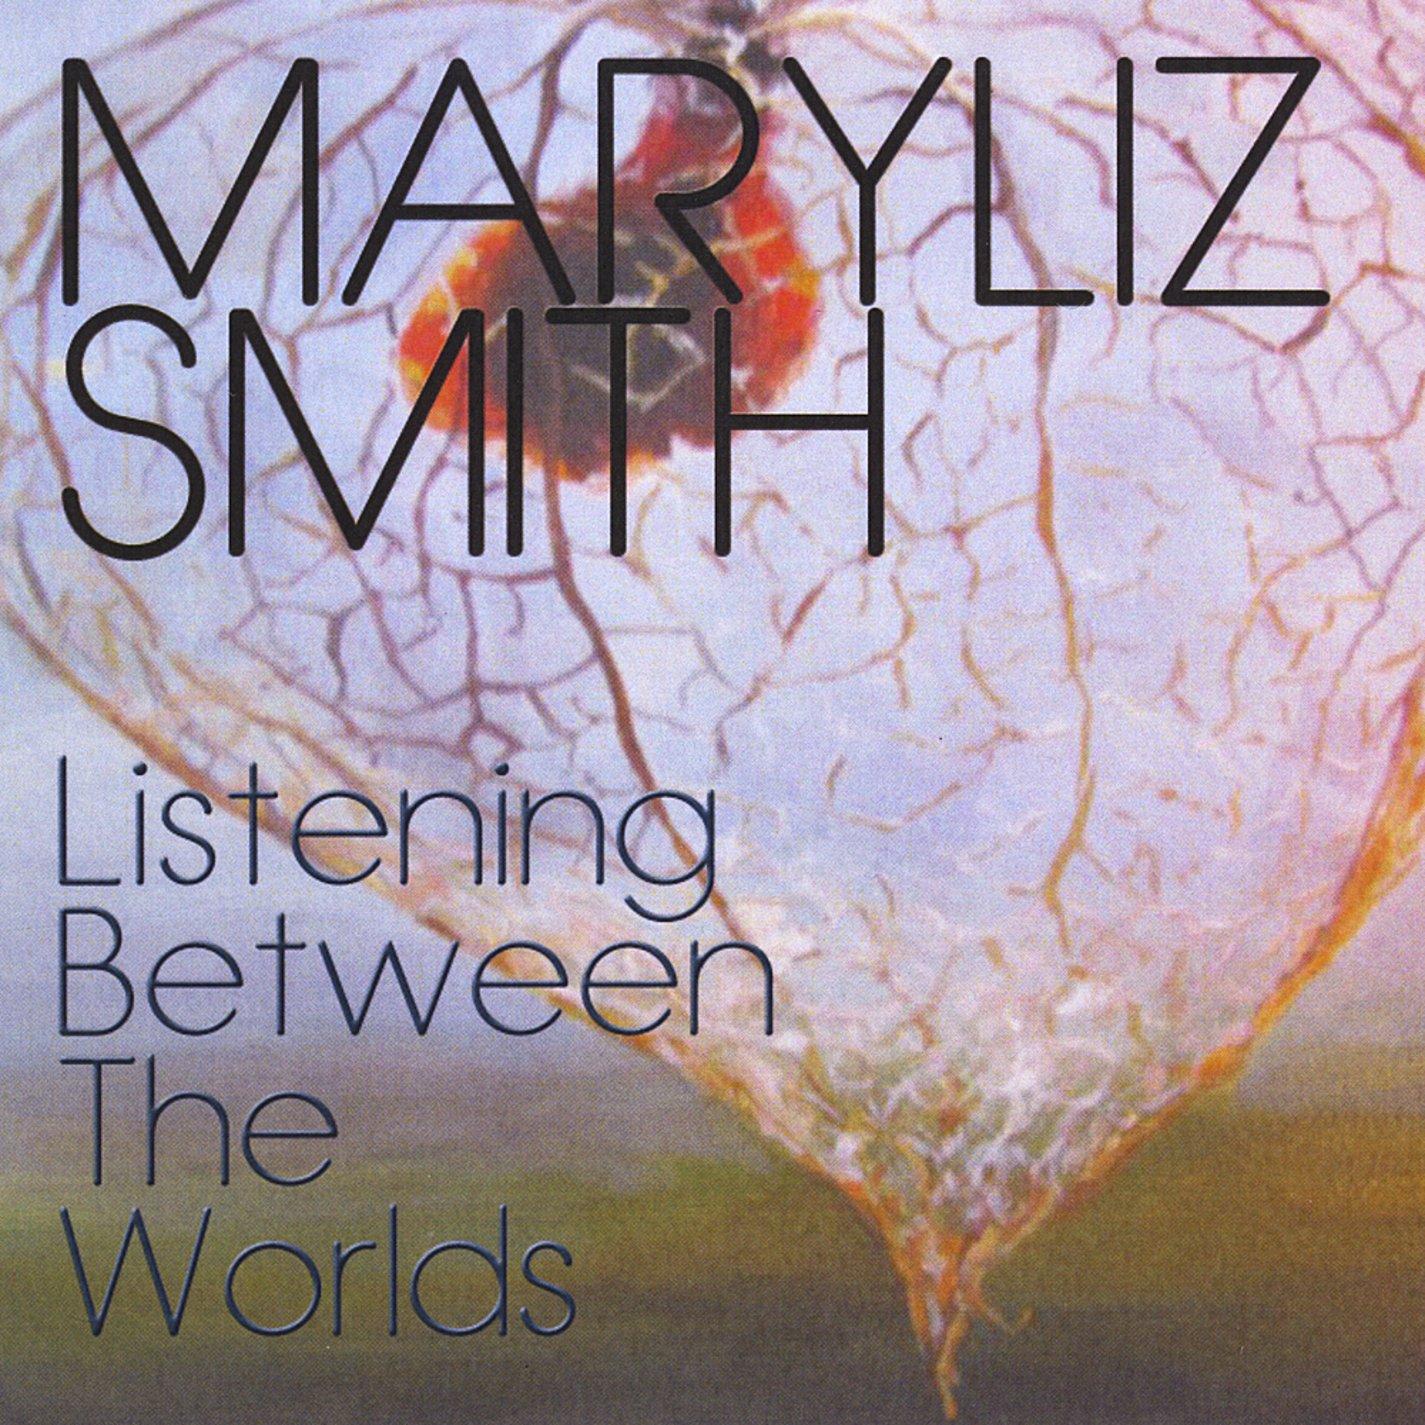 Listening Between Award the Worlds Elegant